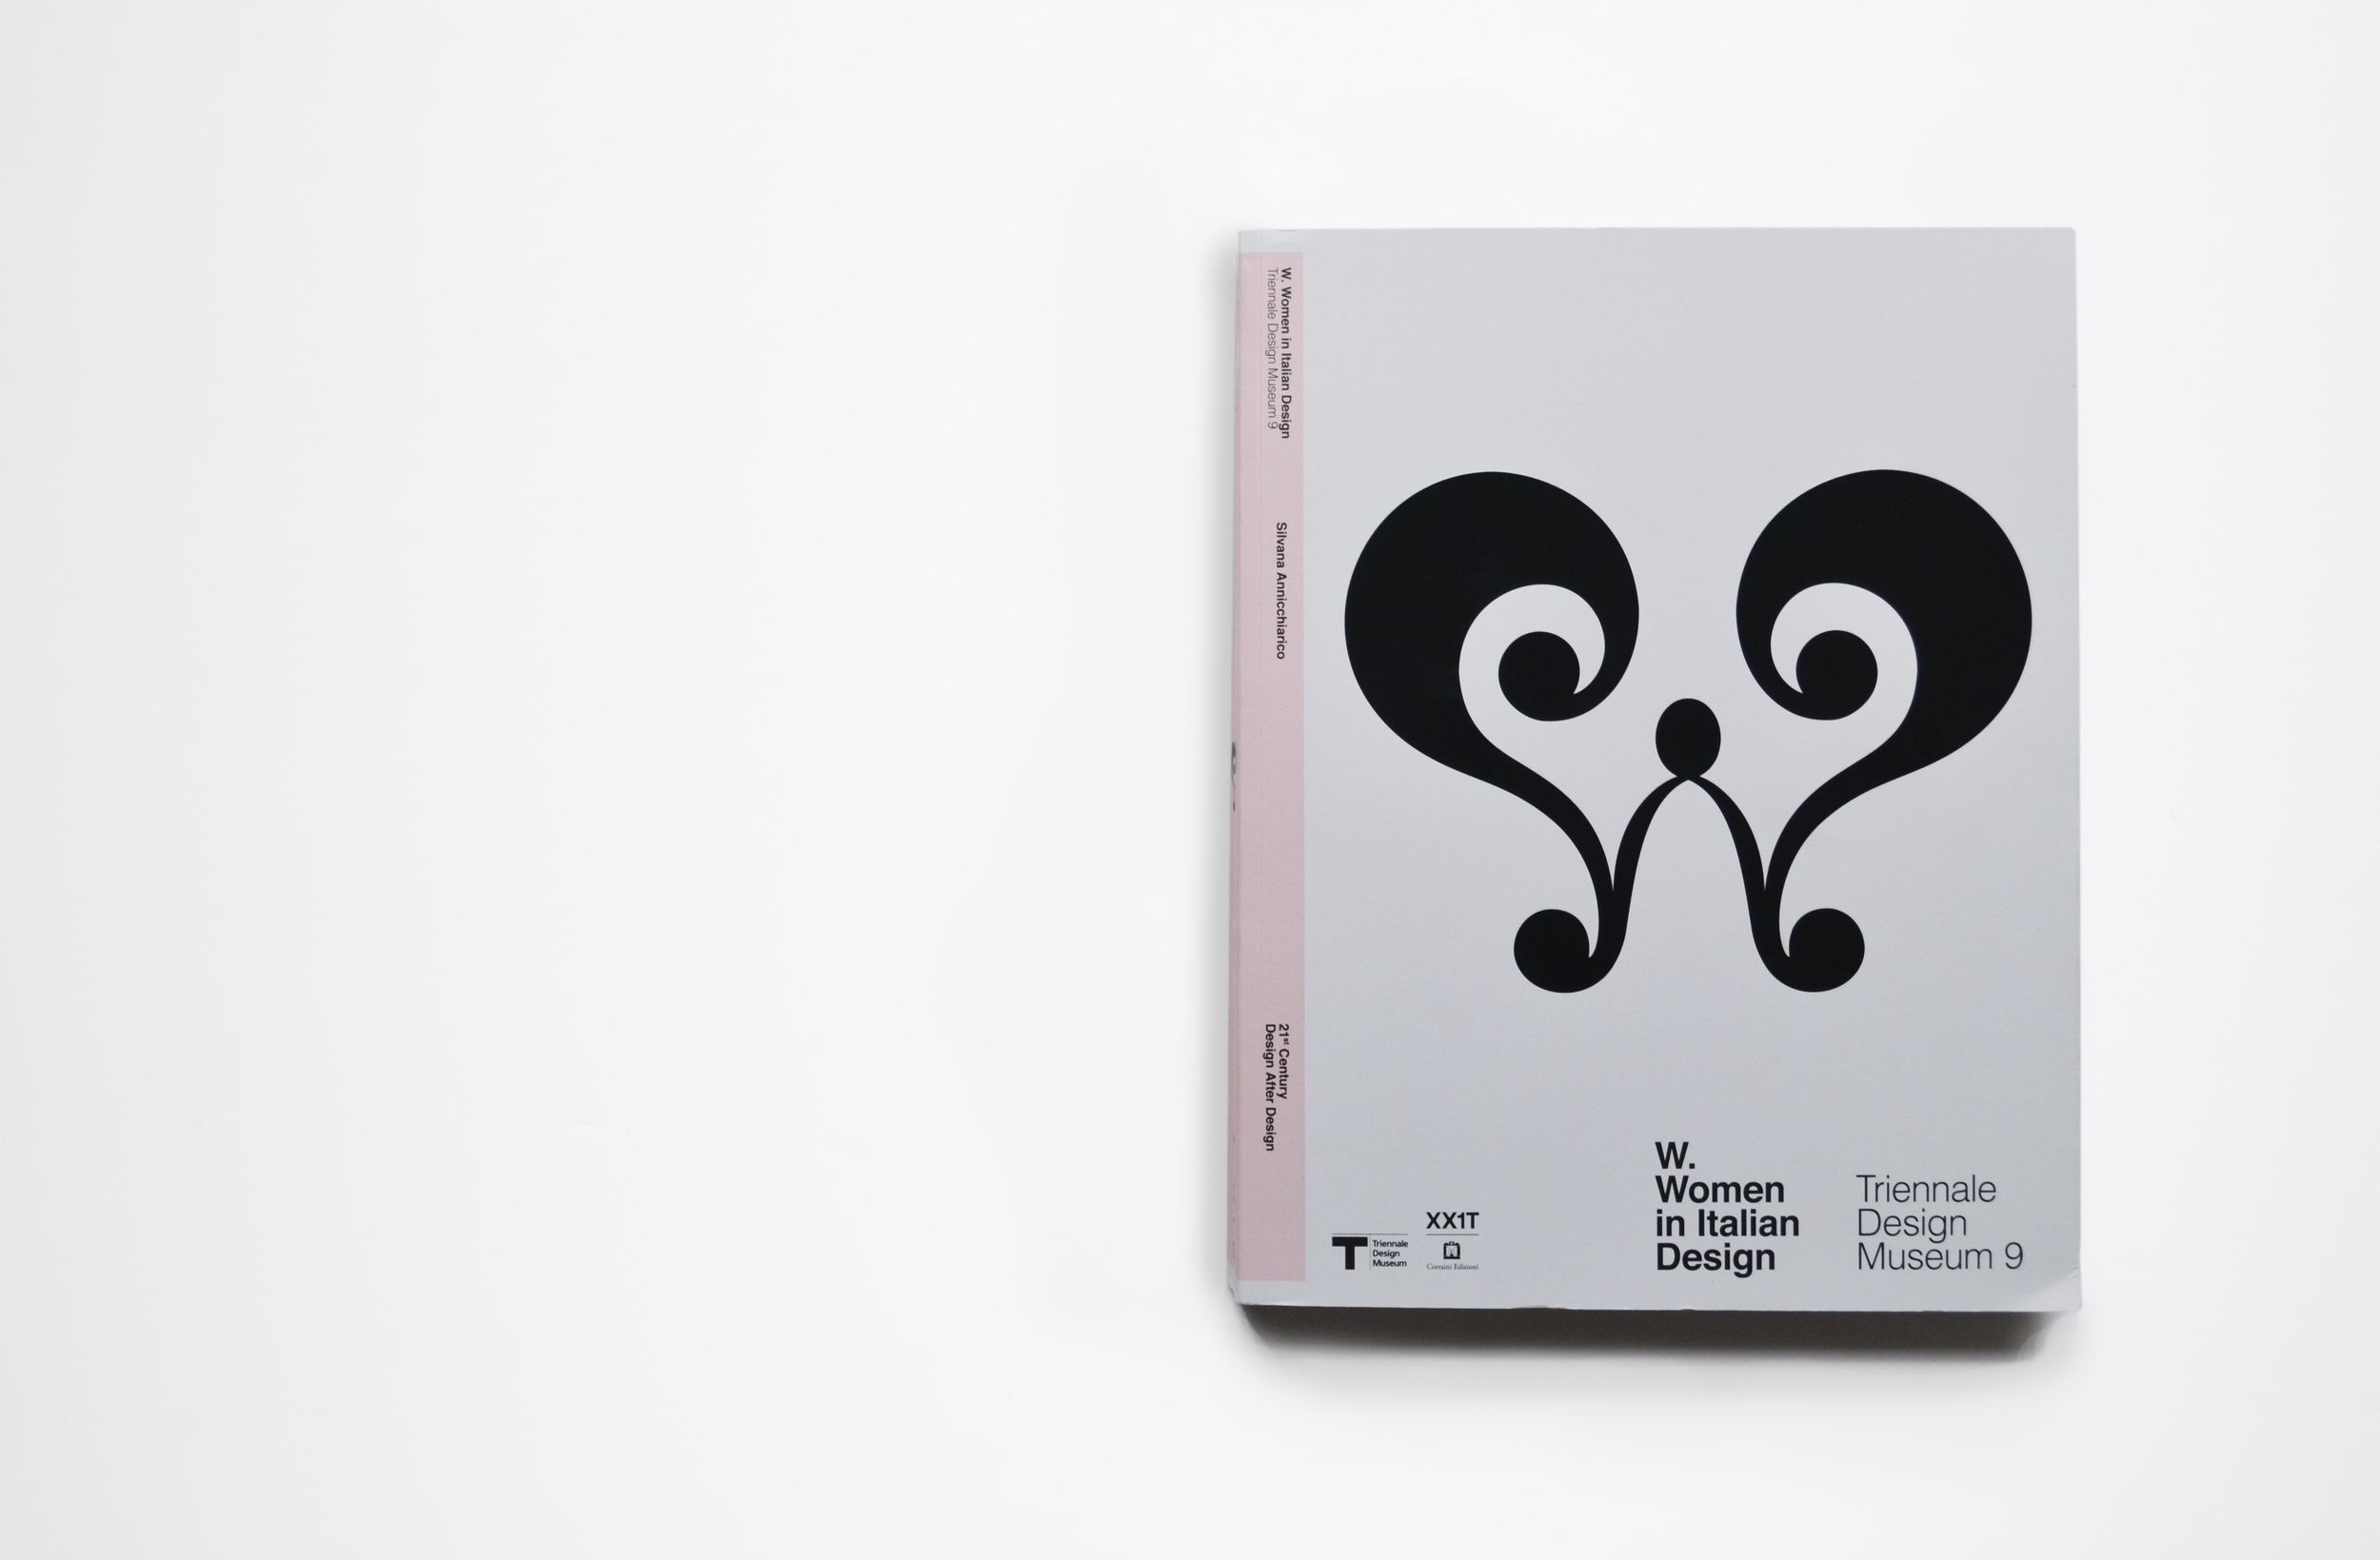 TriennaleDesignMuseum_Catalogue_WWomenInItalianDesign_01.jpg